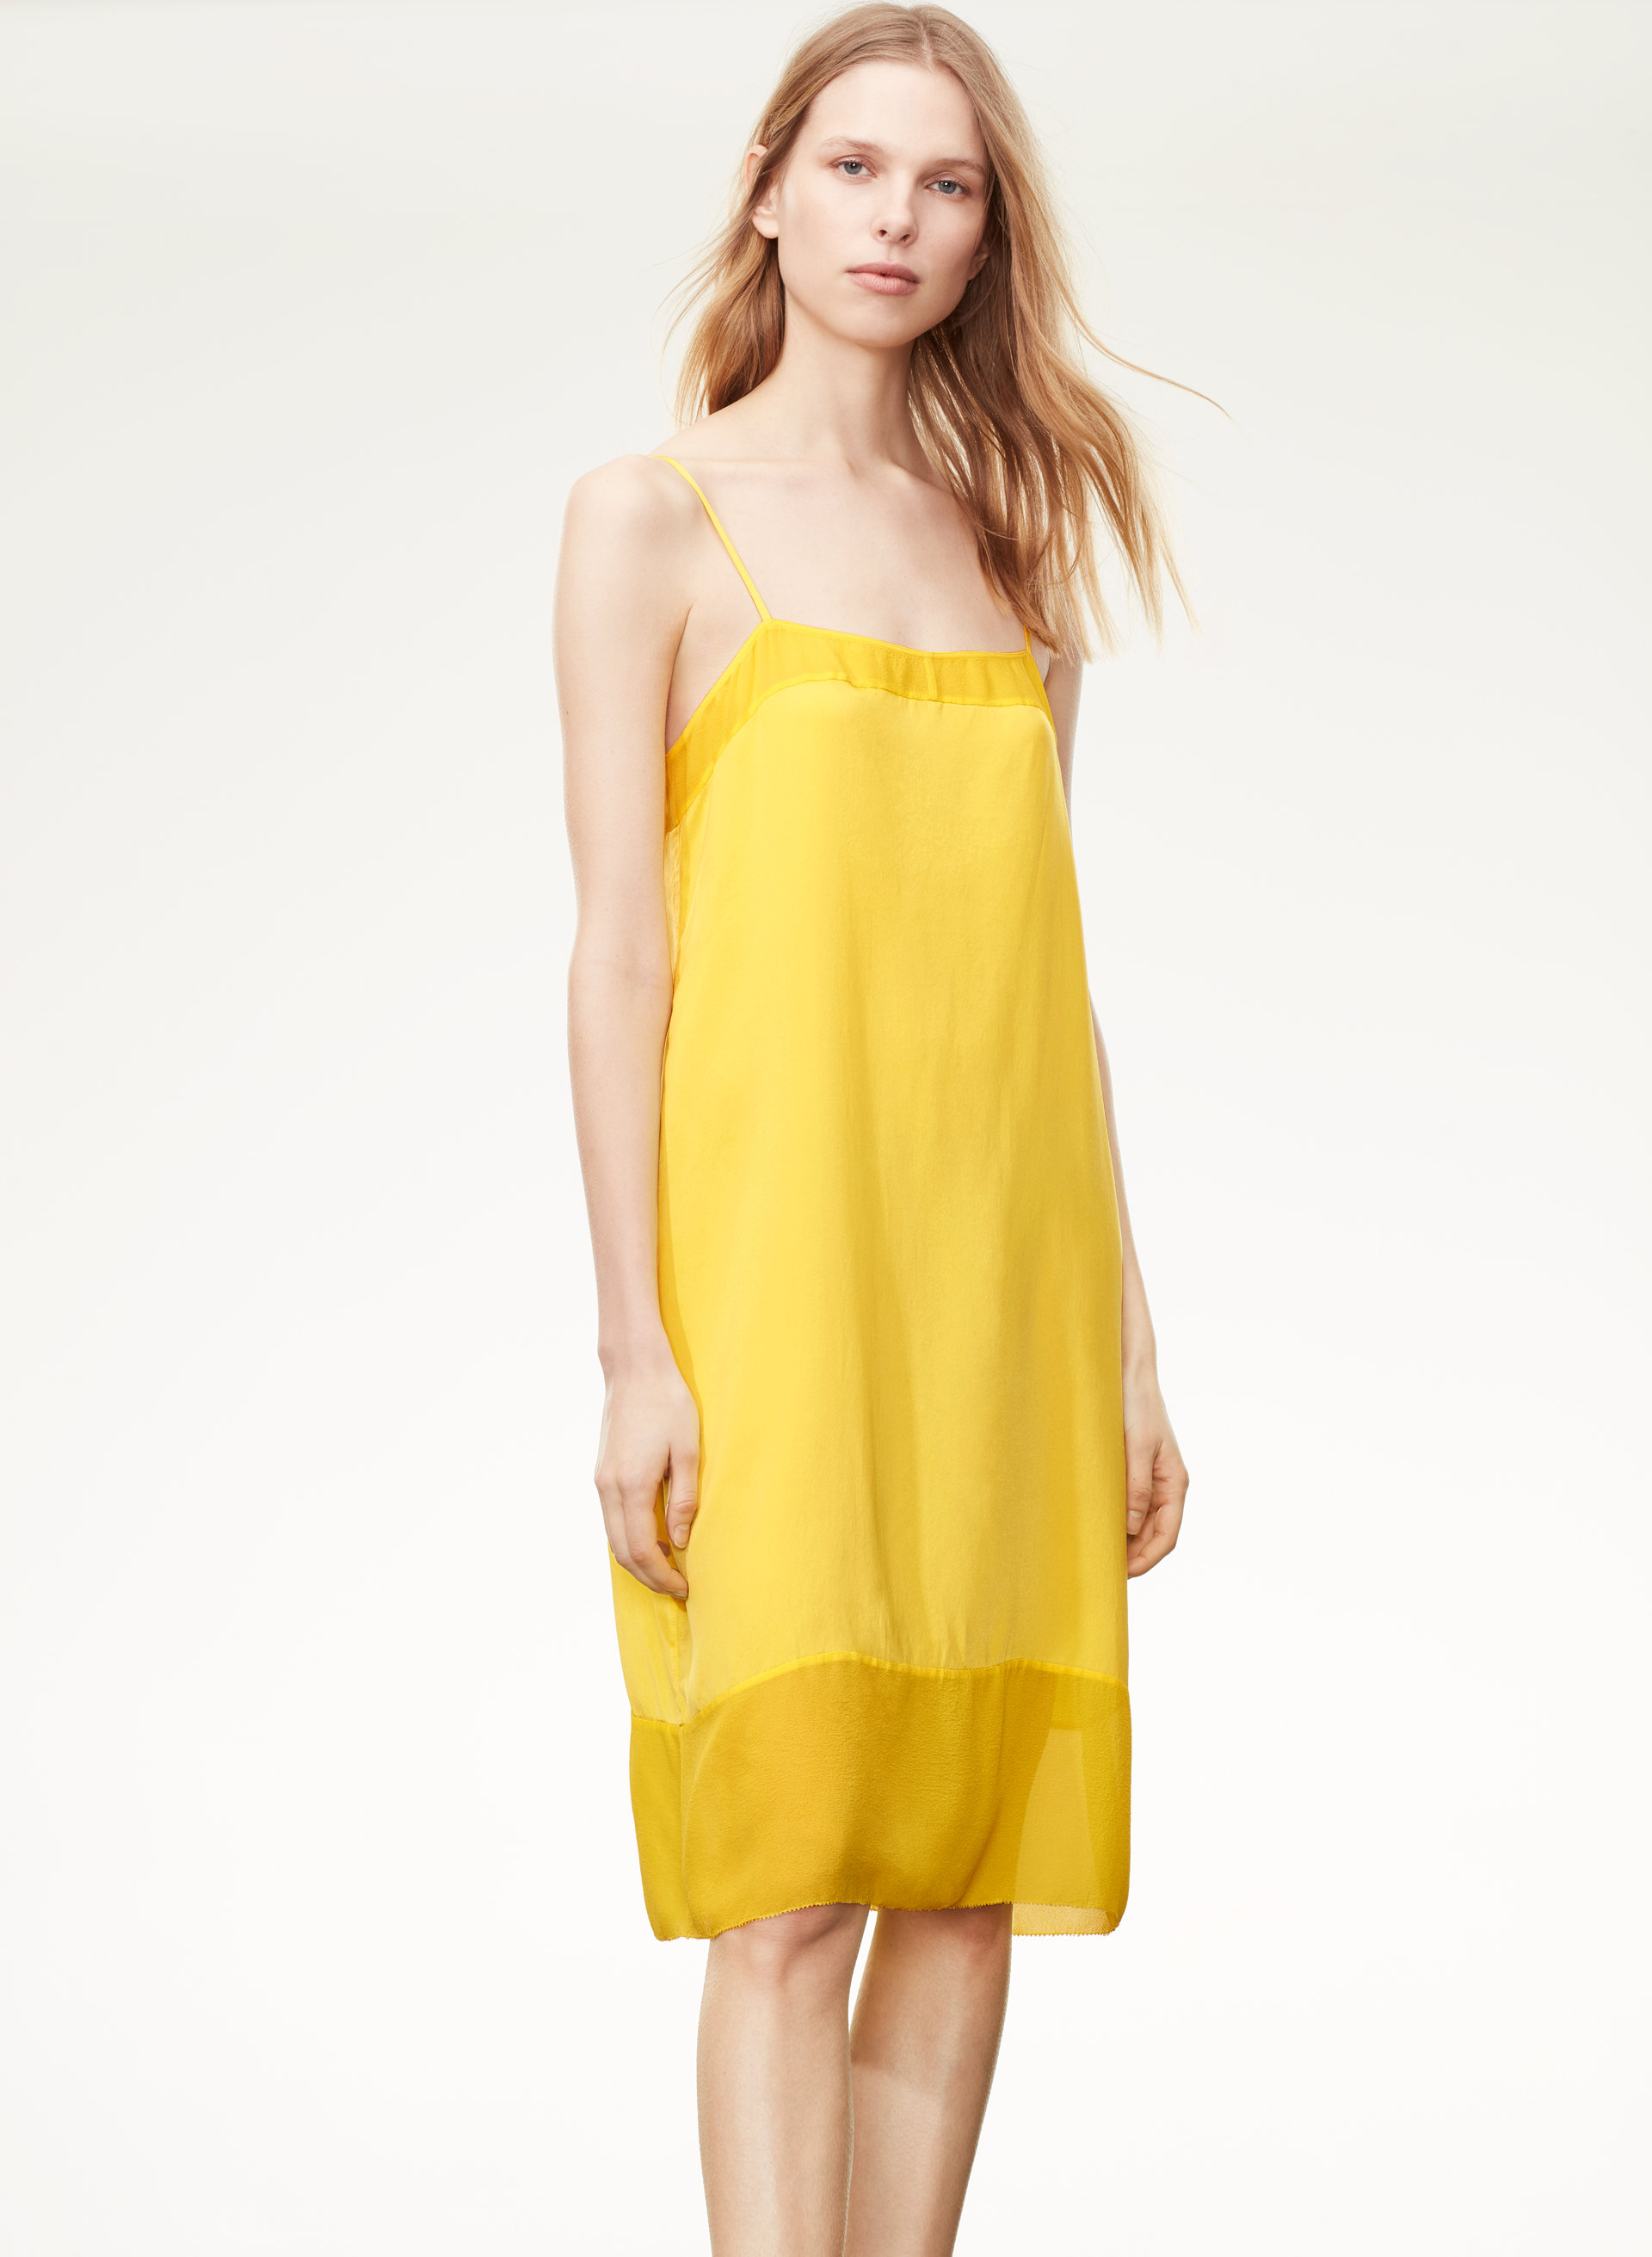 Virton Dress - Aritzia    $59.99